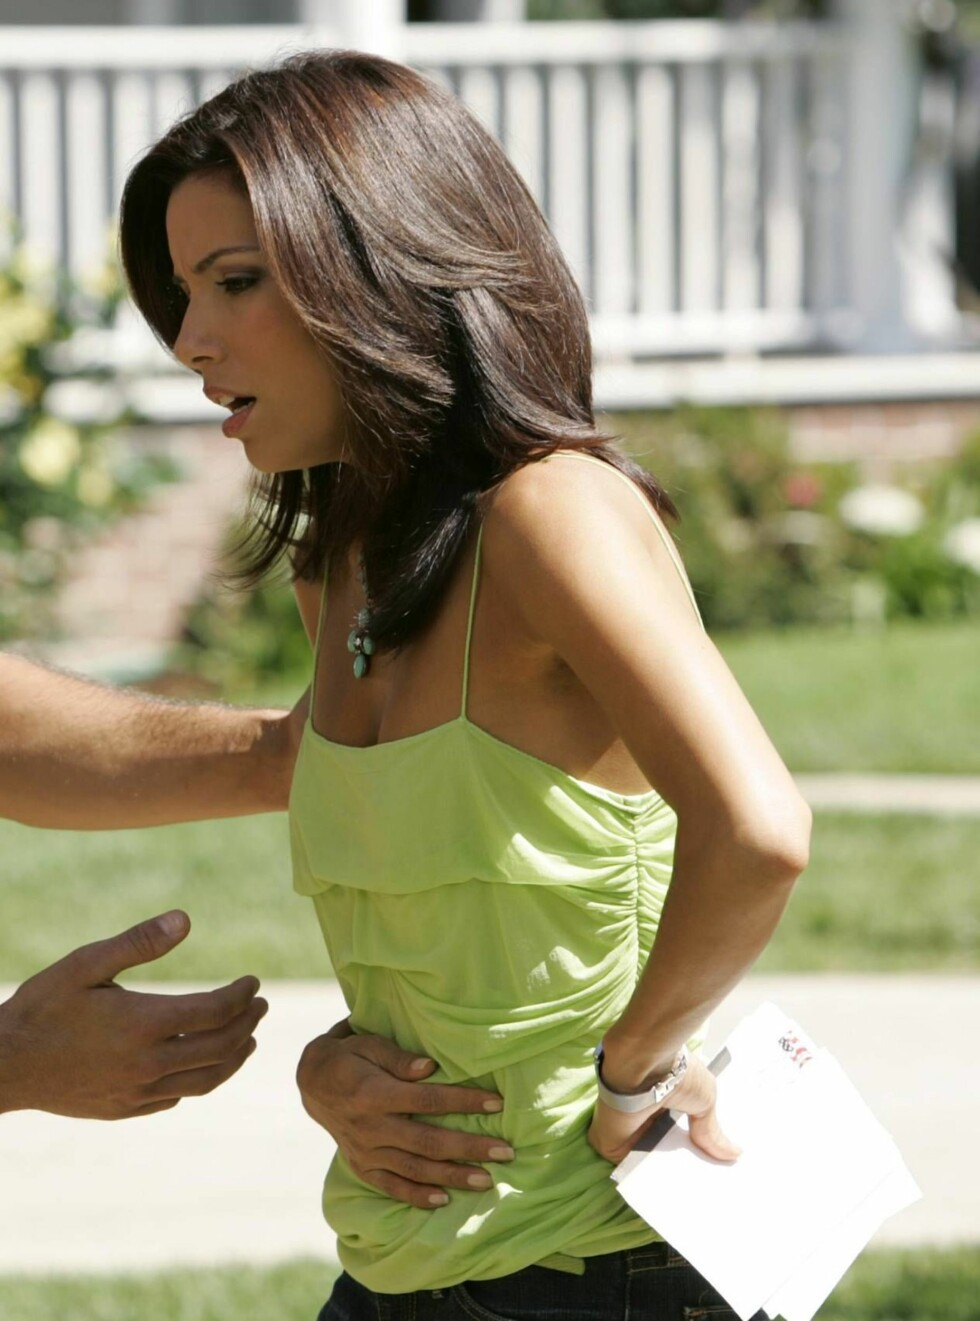 Frustrerte fruer (Desperate Housewives) - Amerikansk dramaserie - Eva Longoria (Gabrielle Solis), Jesse Metcalfe (John) Foto: TV2